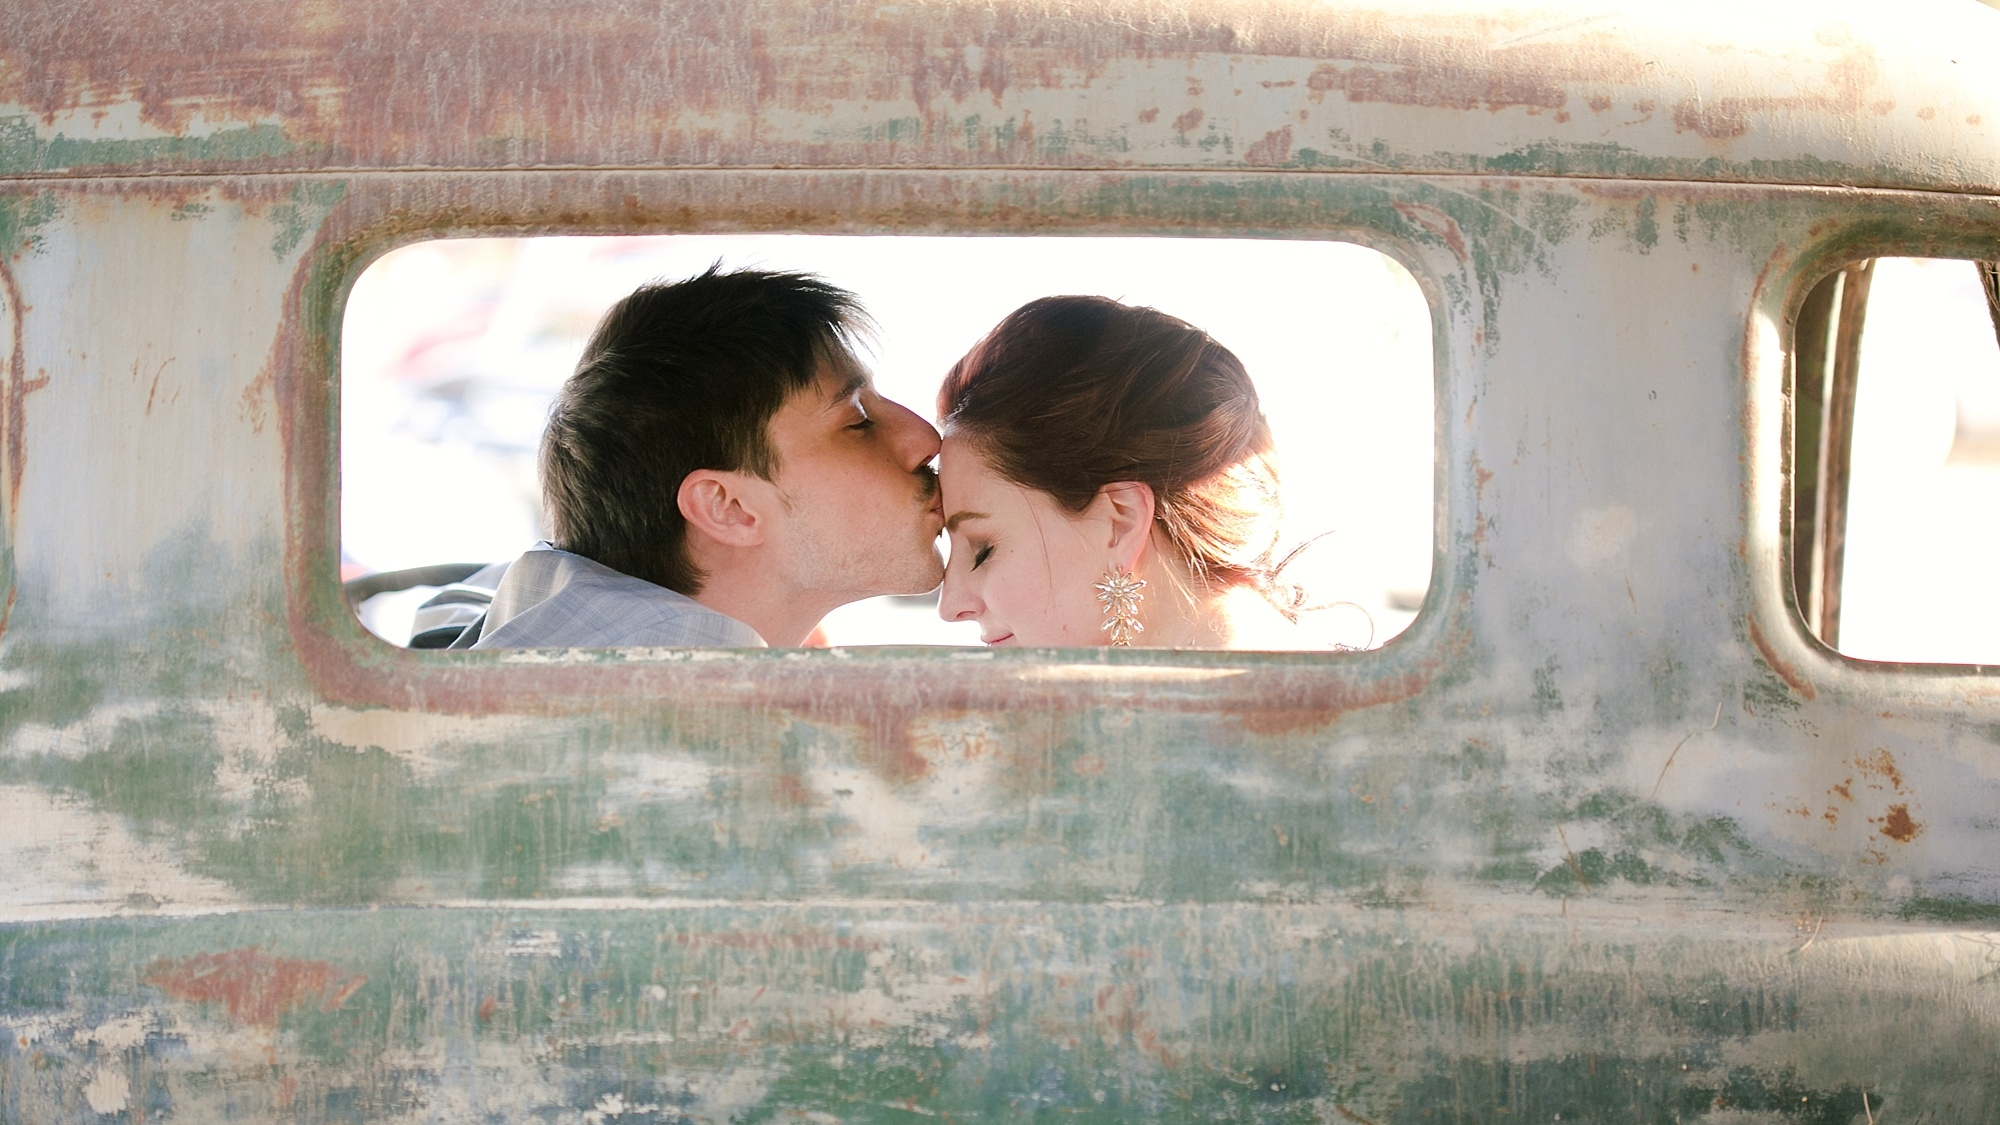 old-car-wedding-kiss